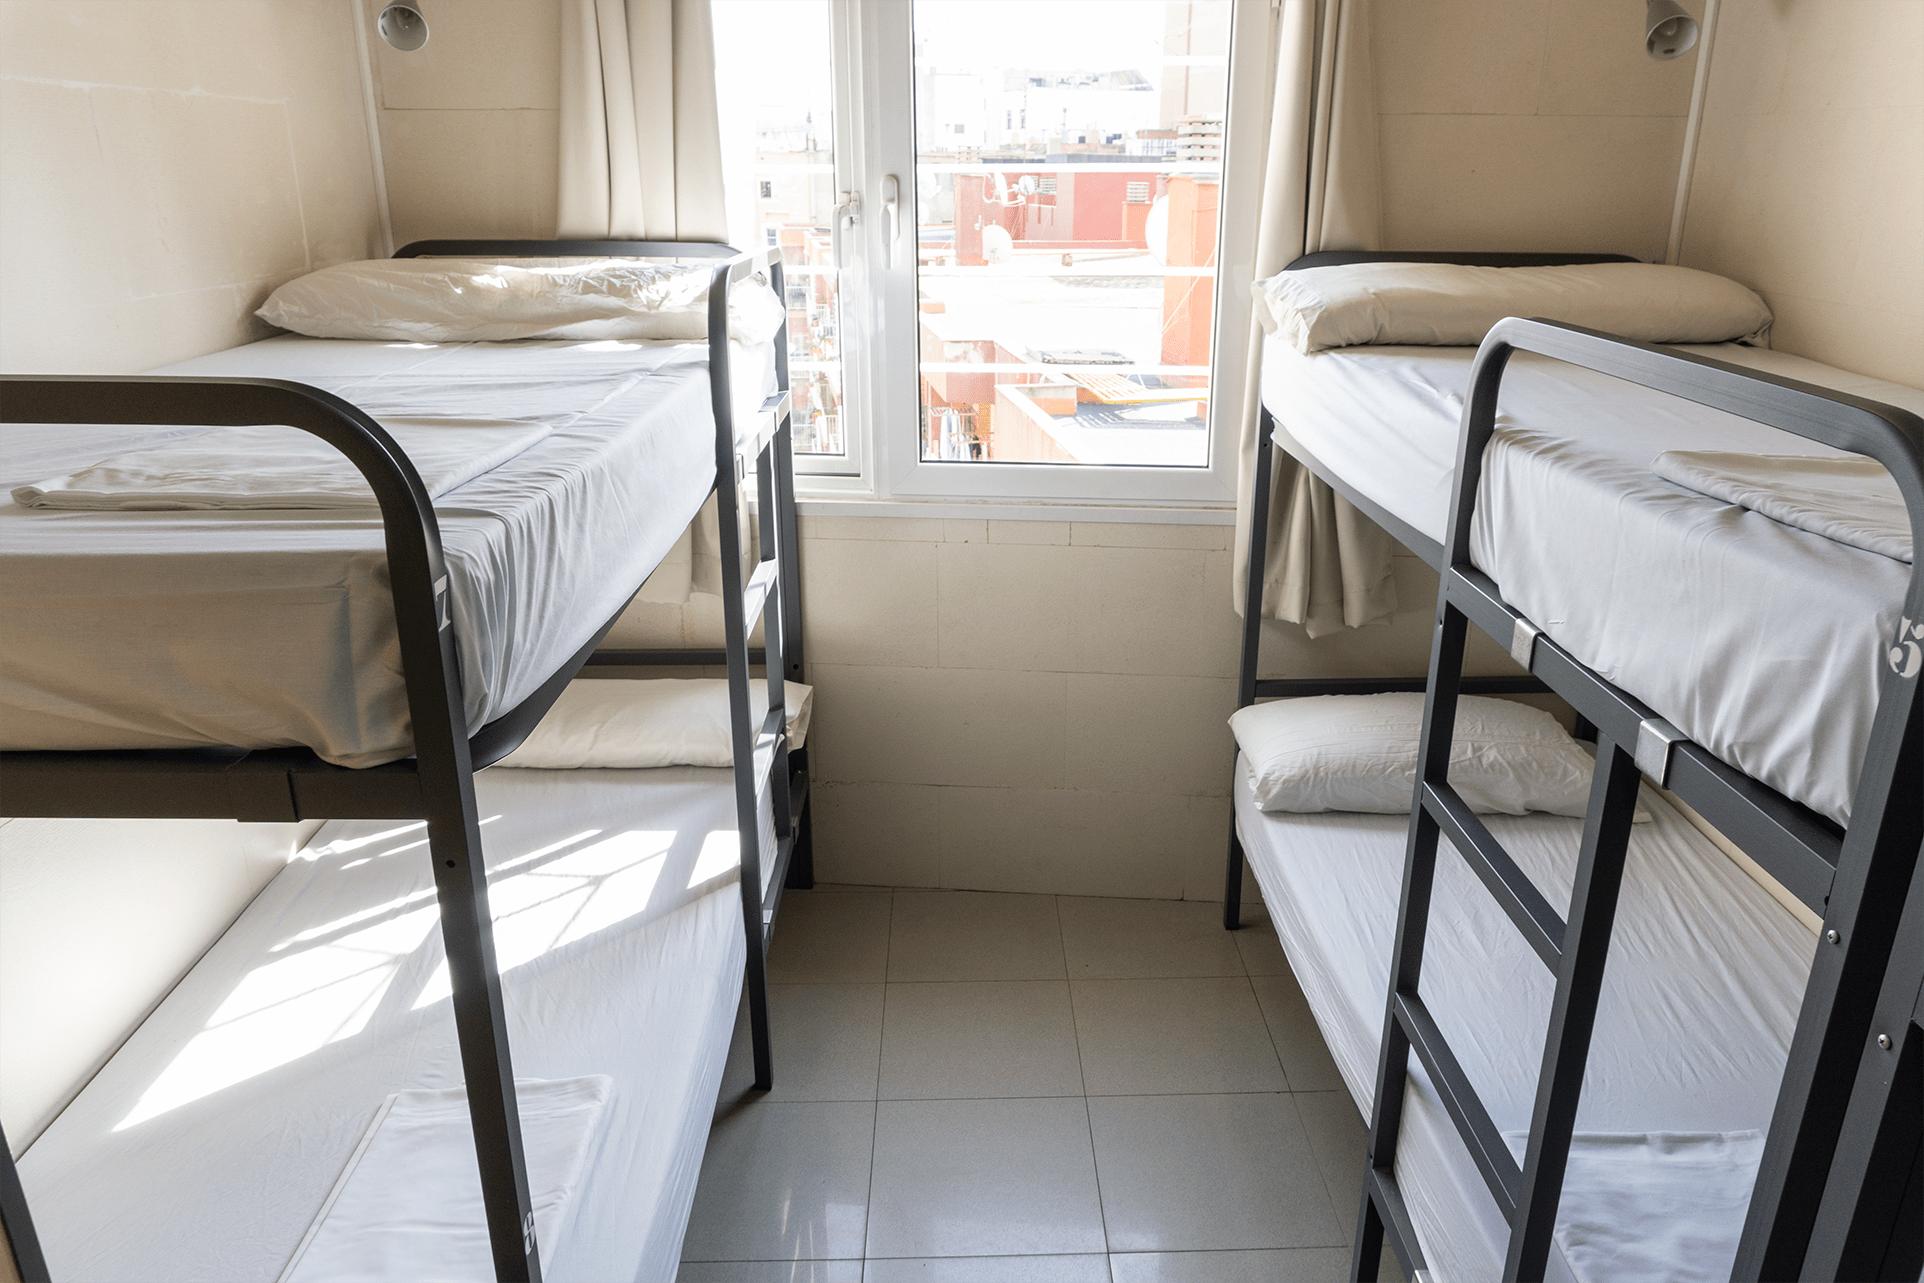 HOSTEL - Be Sound Hostel